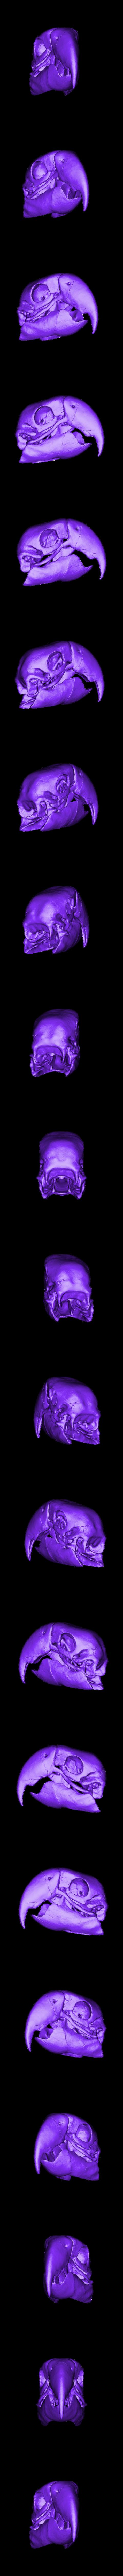 NEW-Skull-repaired-repaired-repaired.stl Download STL file Macow Skeleton • 3D printing template, LordLilapause